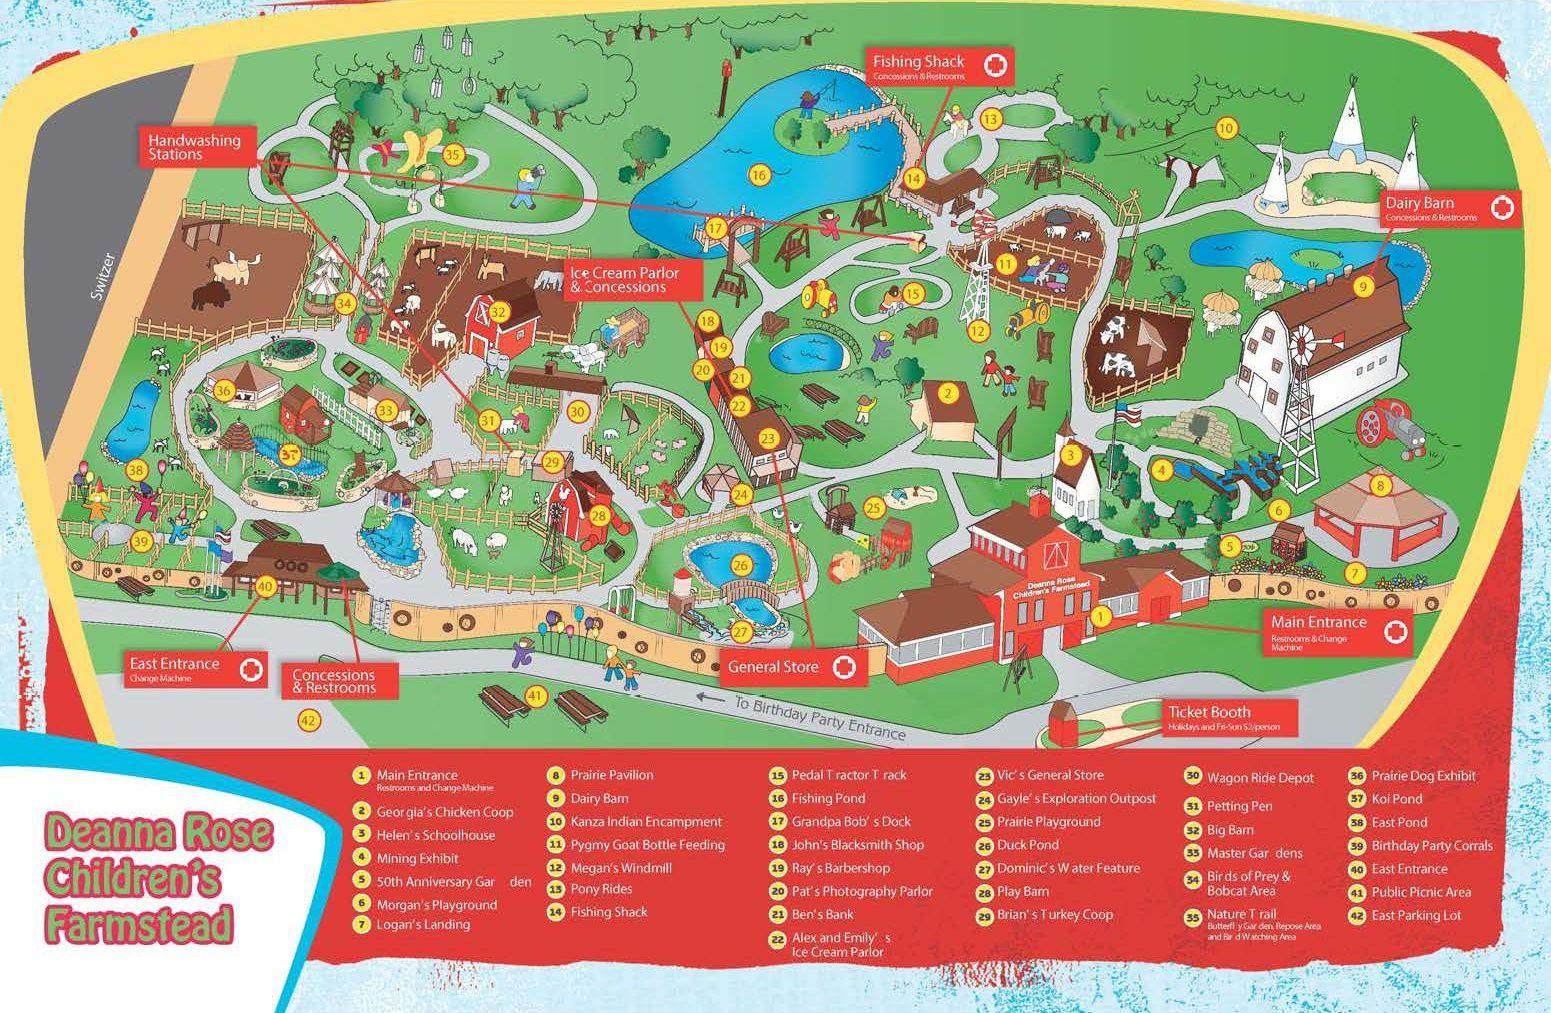 Deanna Rose Cheat Sheet Insider Tips For Fun At The Children S Farmstead Farmstead Fun Rose